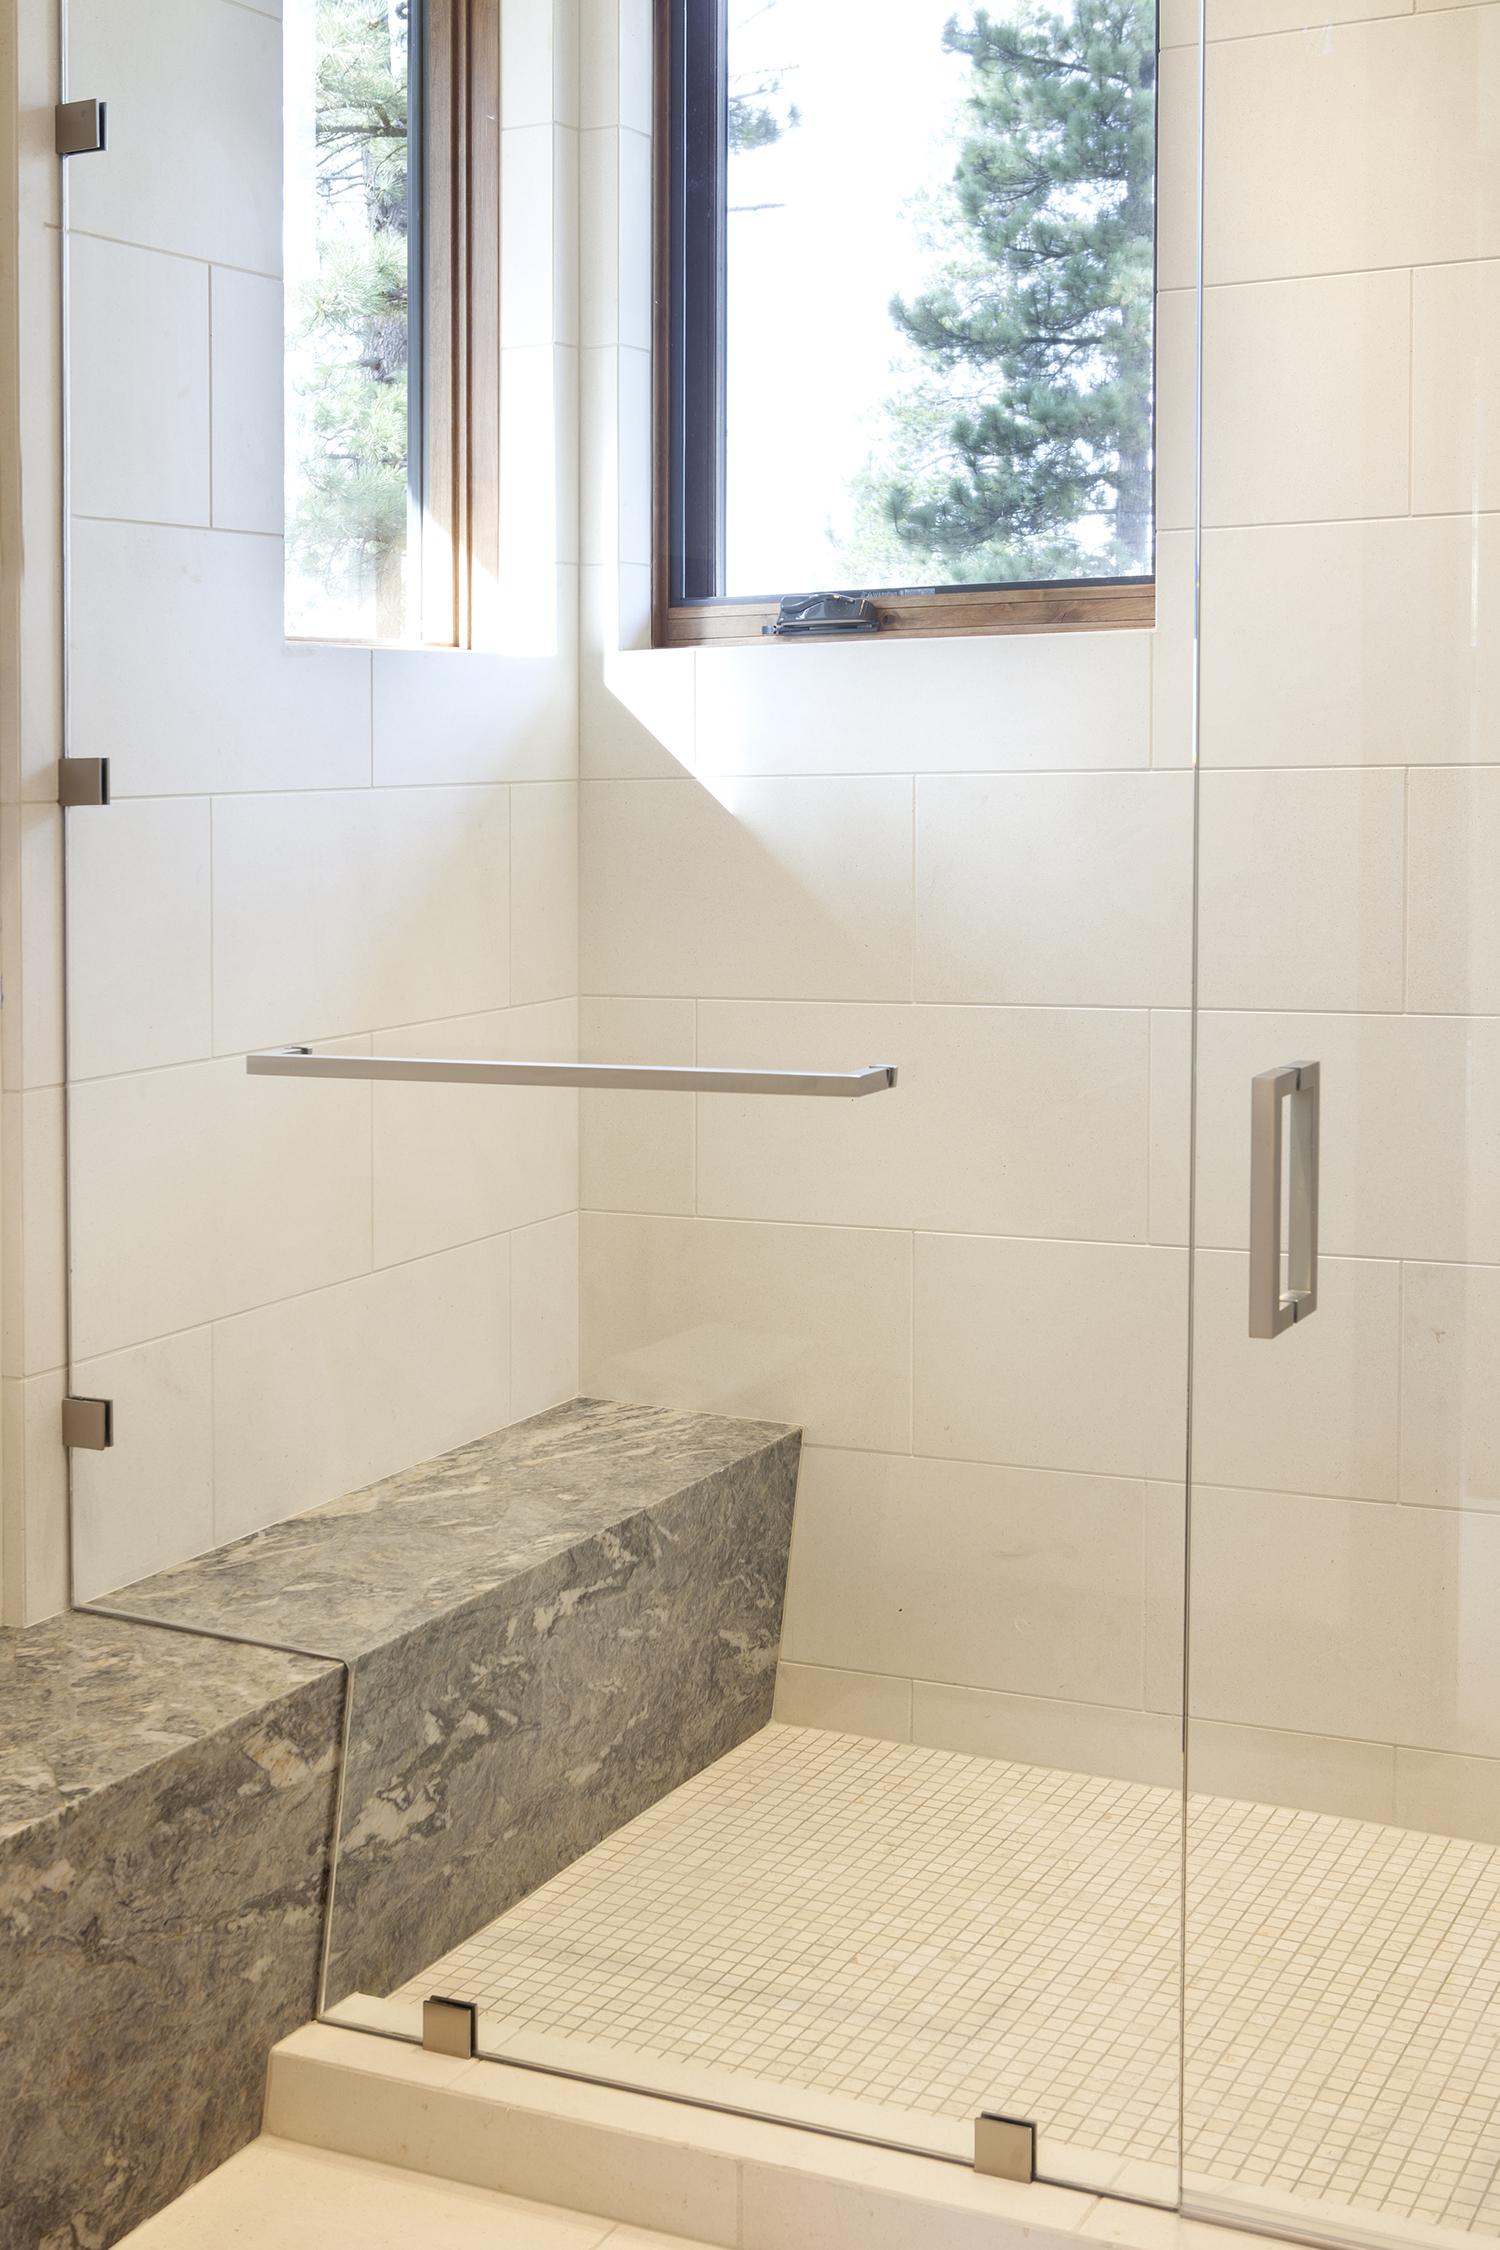 Lot 483_Bunk Bath_Shower_Bench.jpg